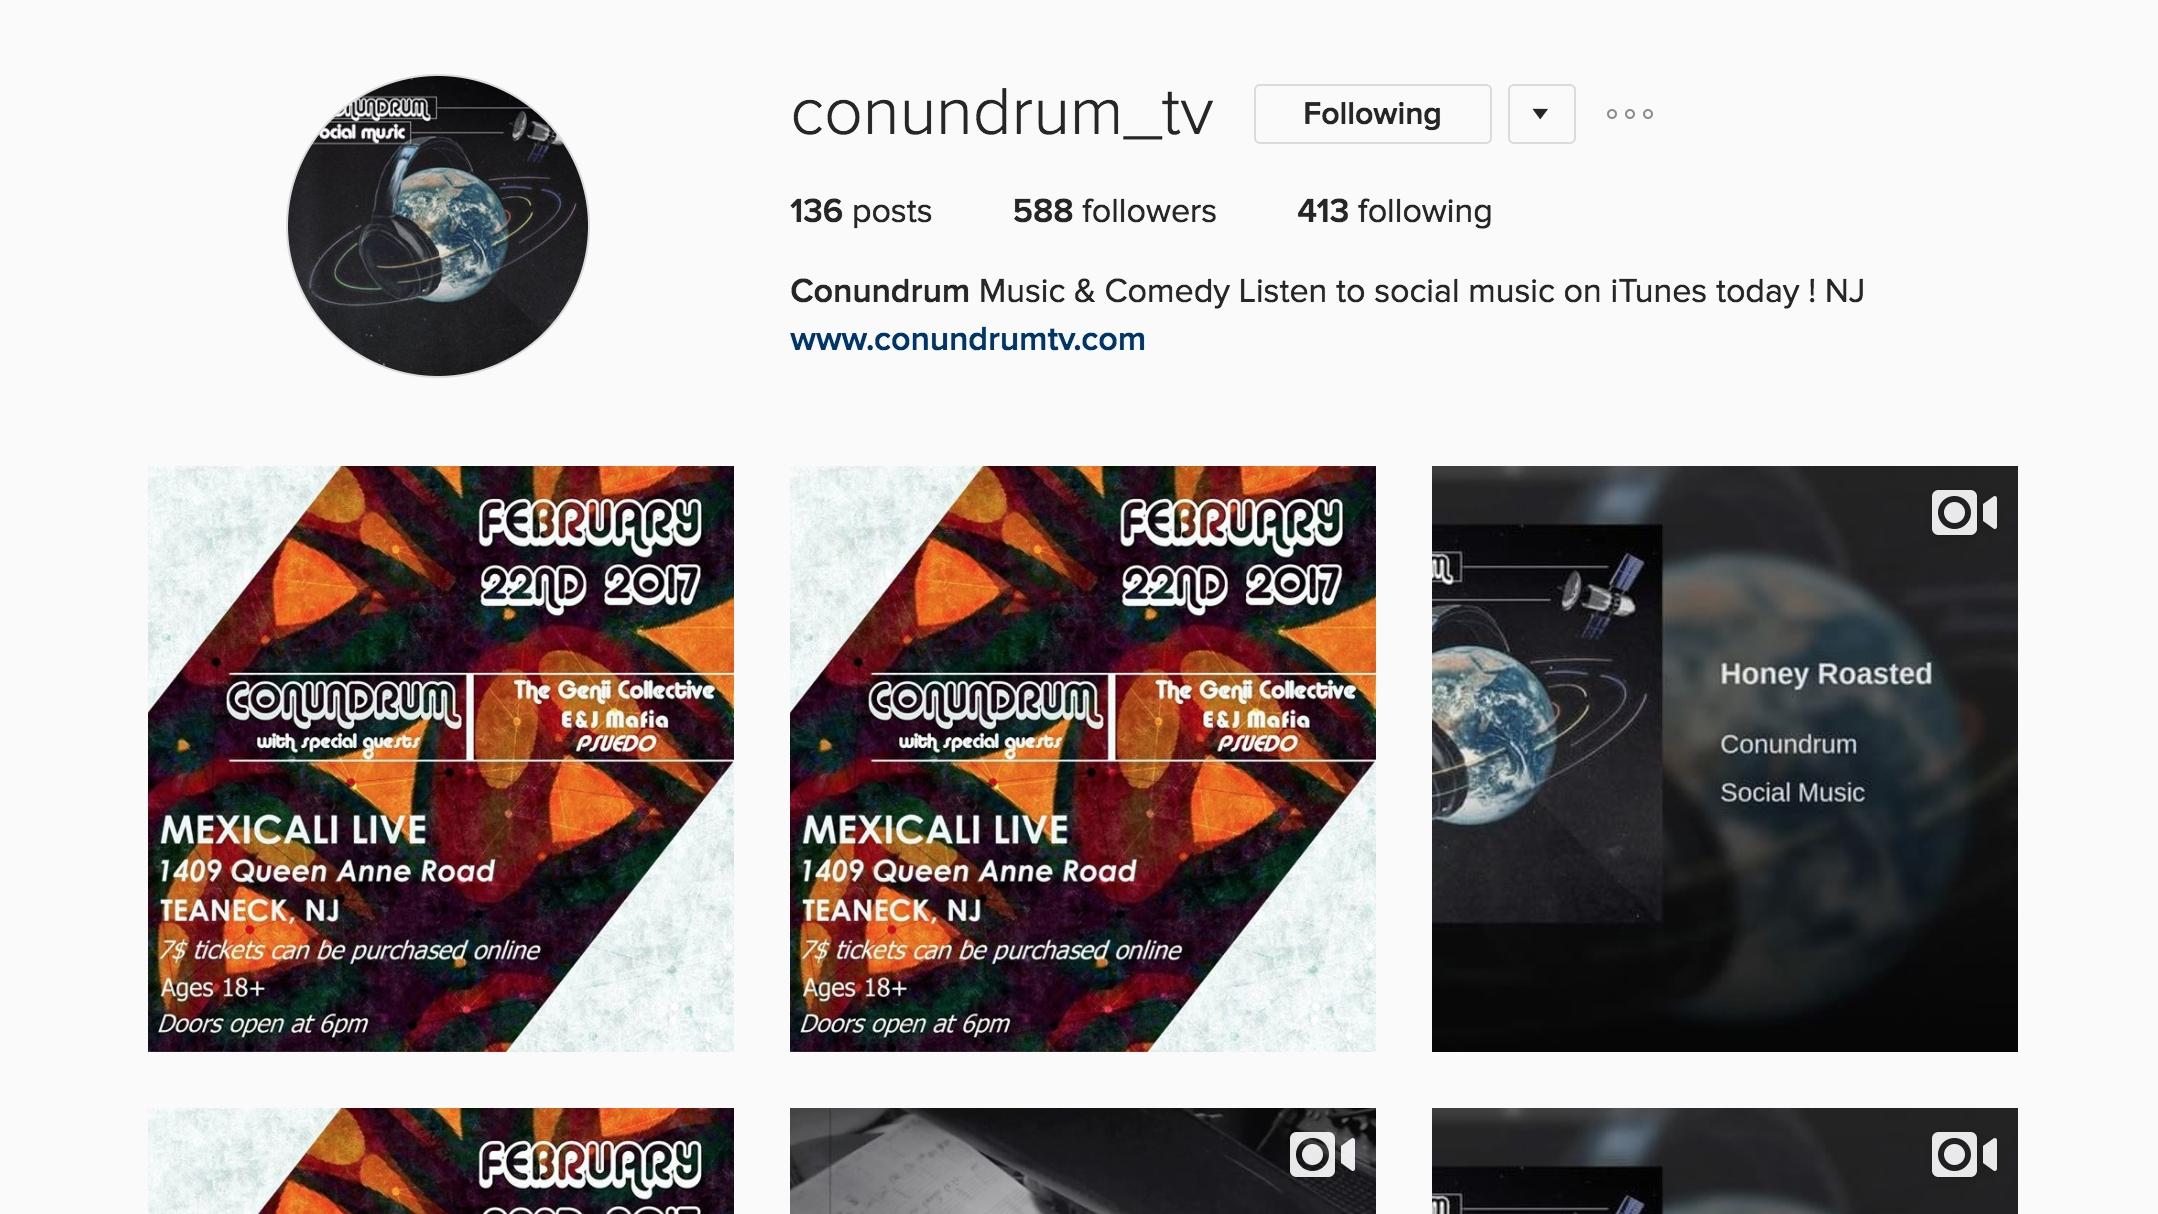 Instagram.com/conundrum_tv/